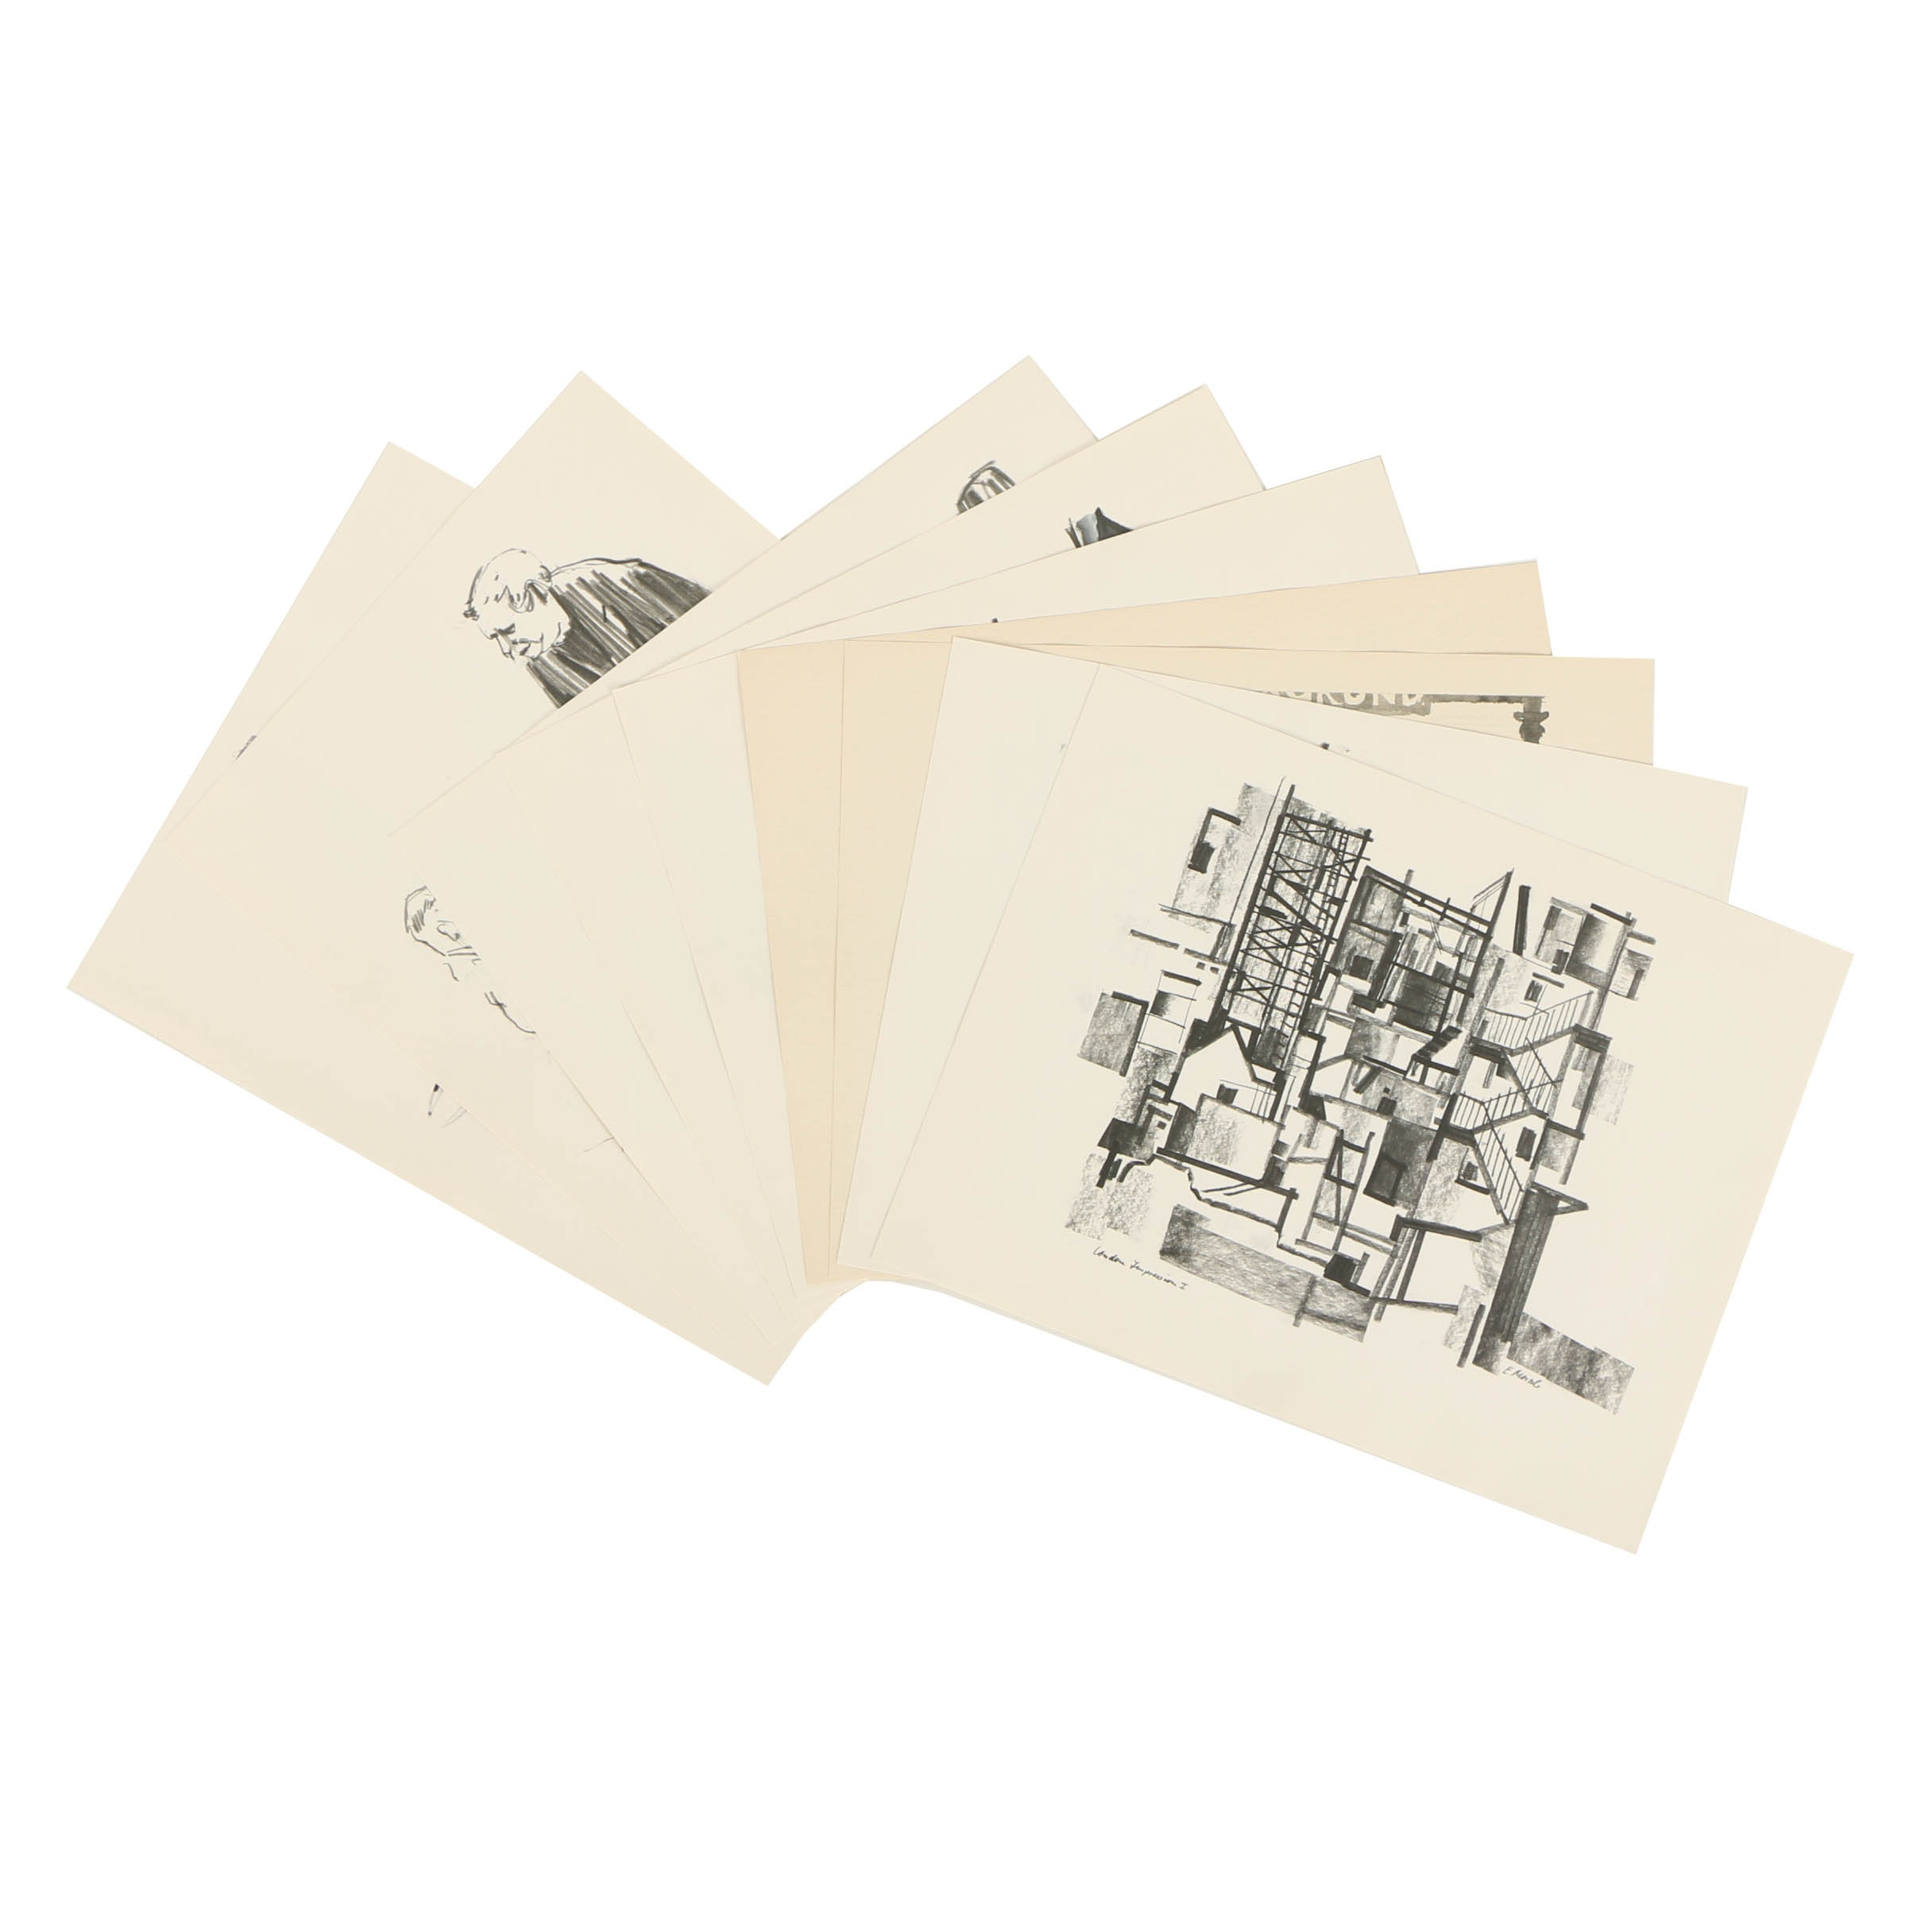 Portfolio of Offset Lithographs and Halftone Prints